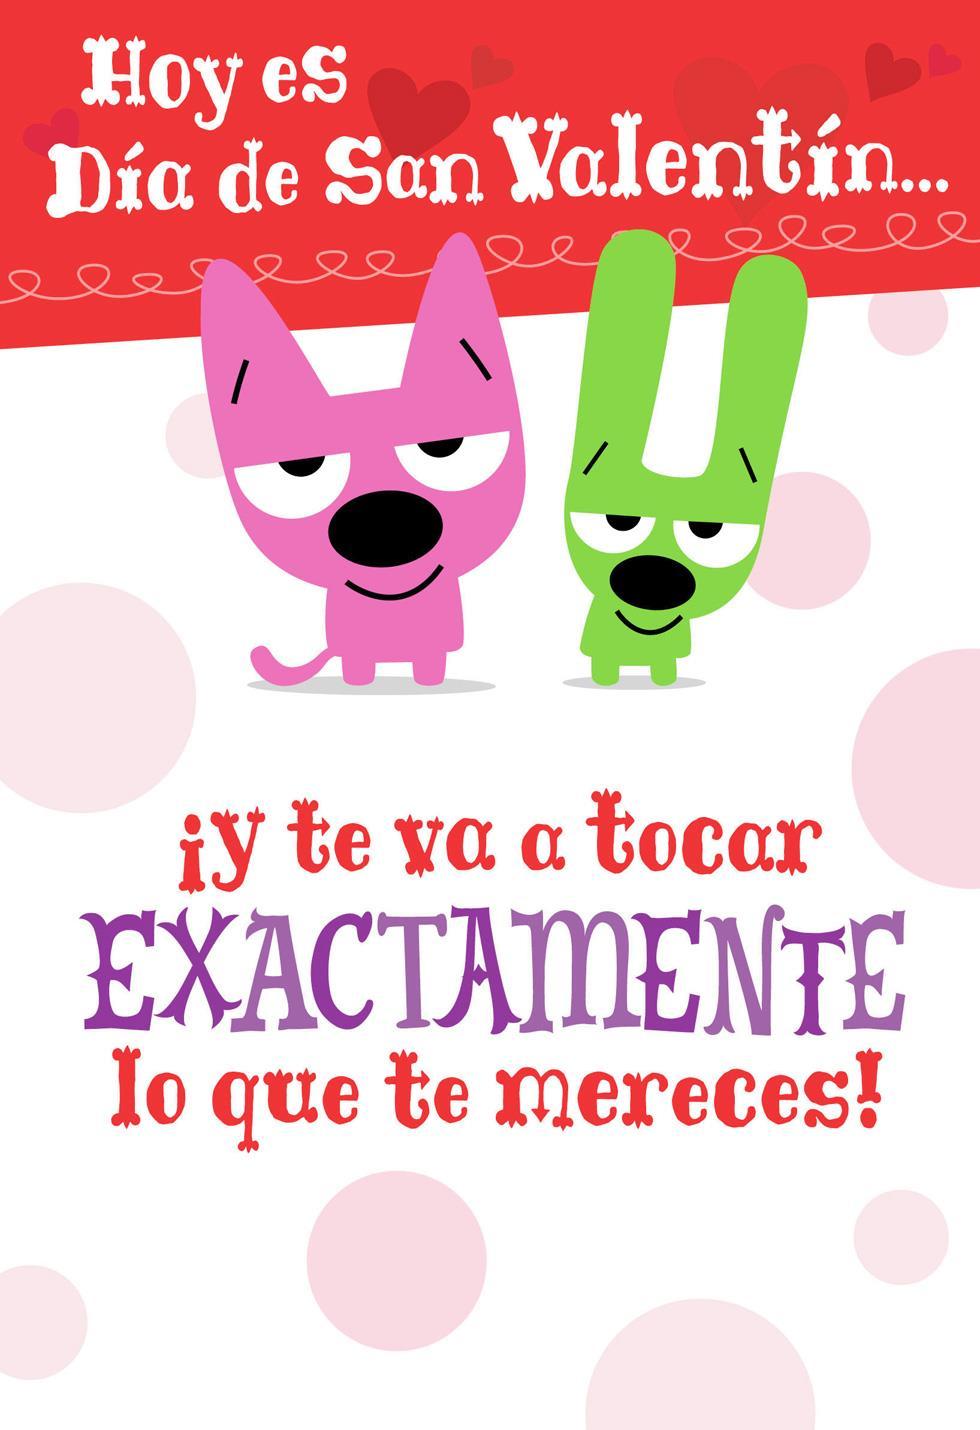 Hoopsampyoyo Smooch Spanish Language Valentines Day Card